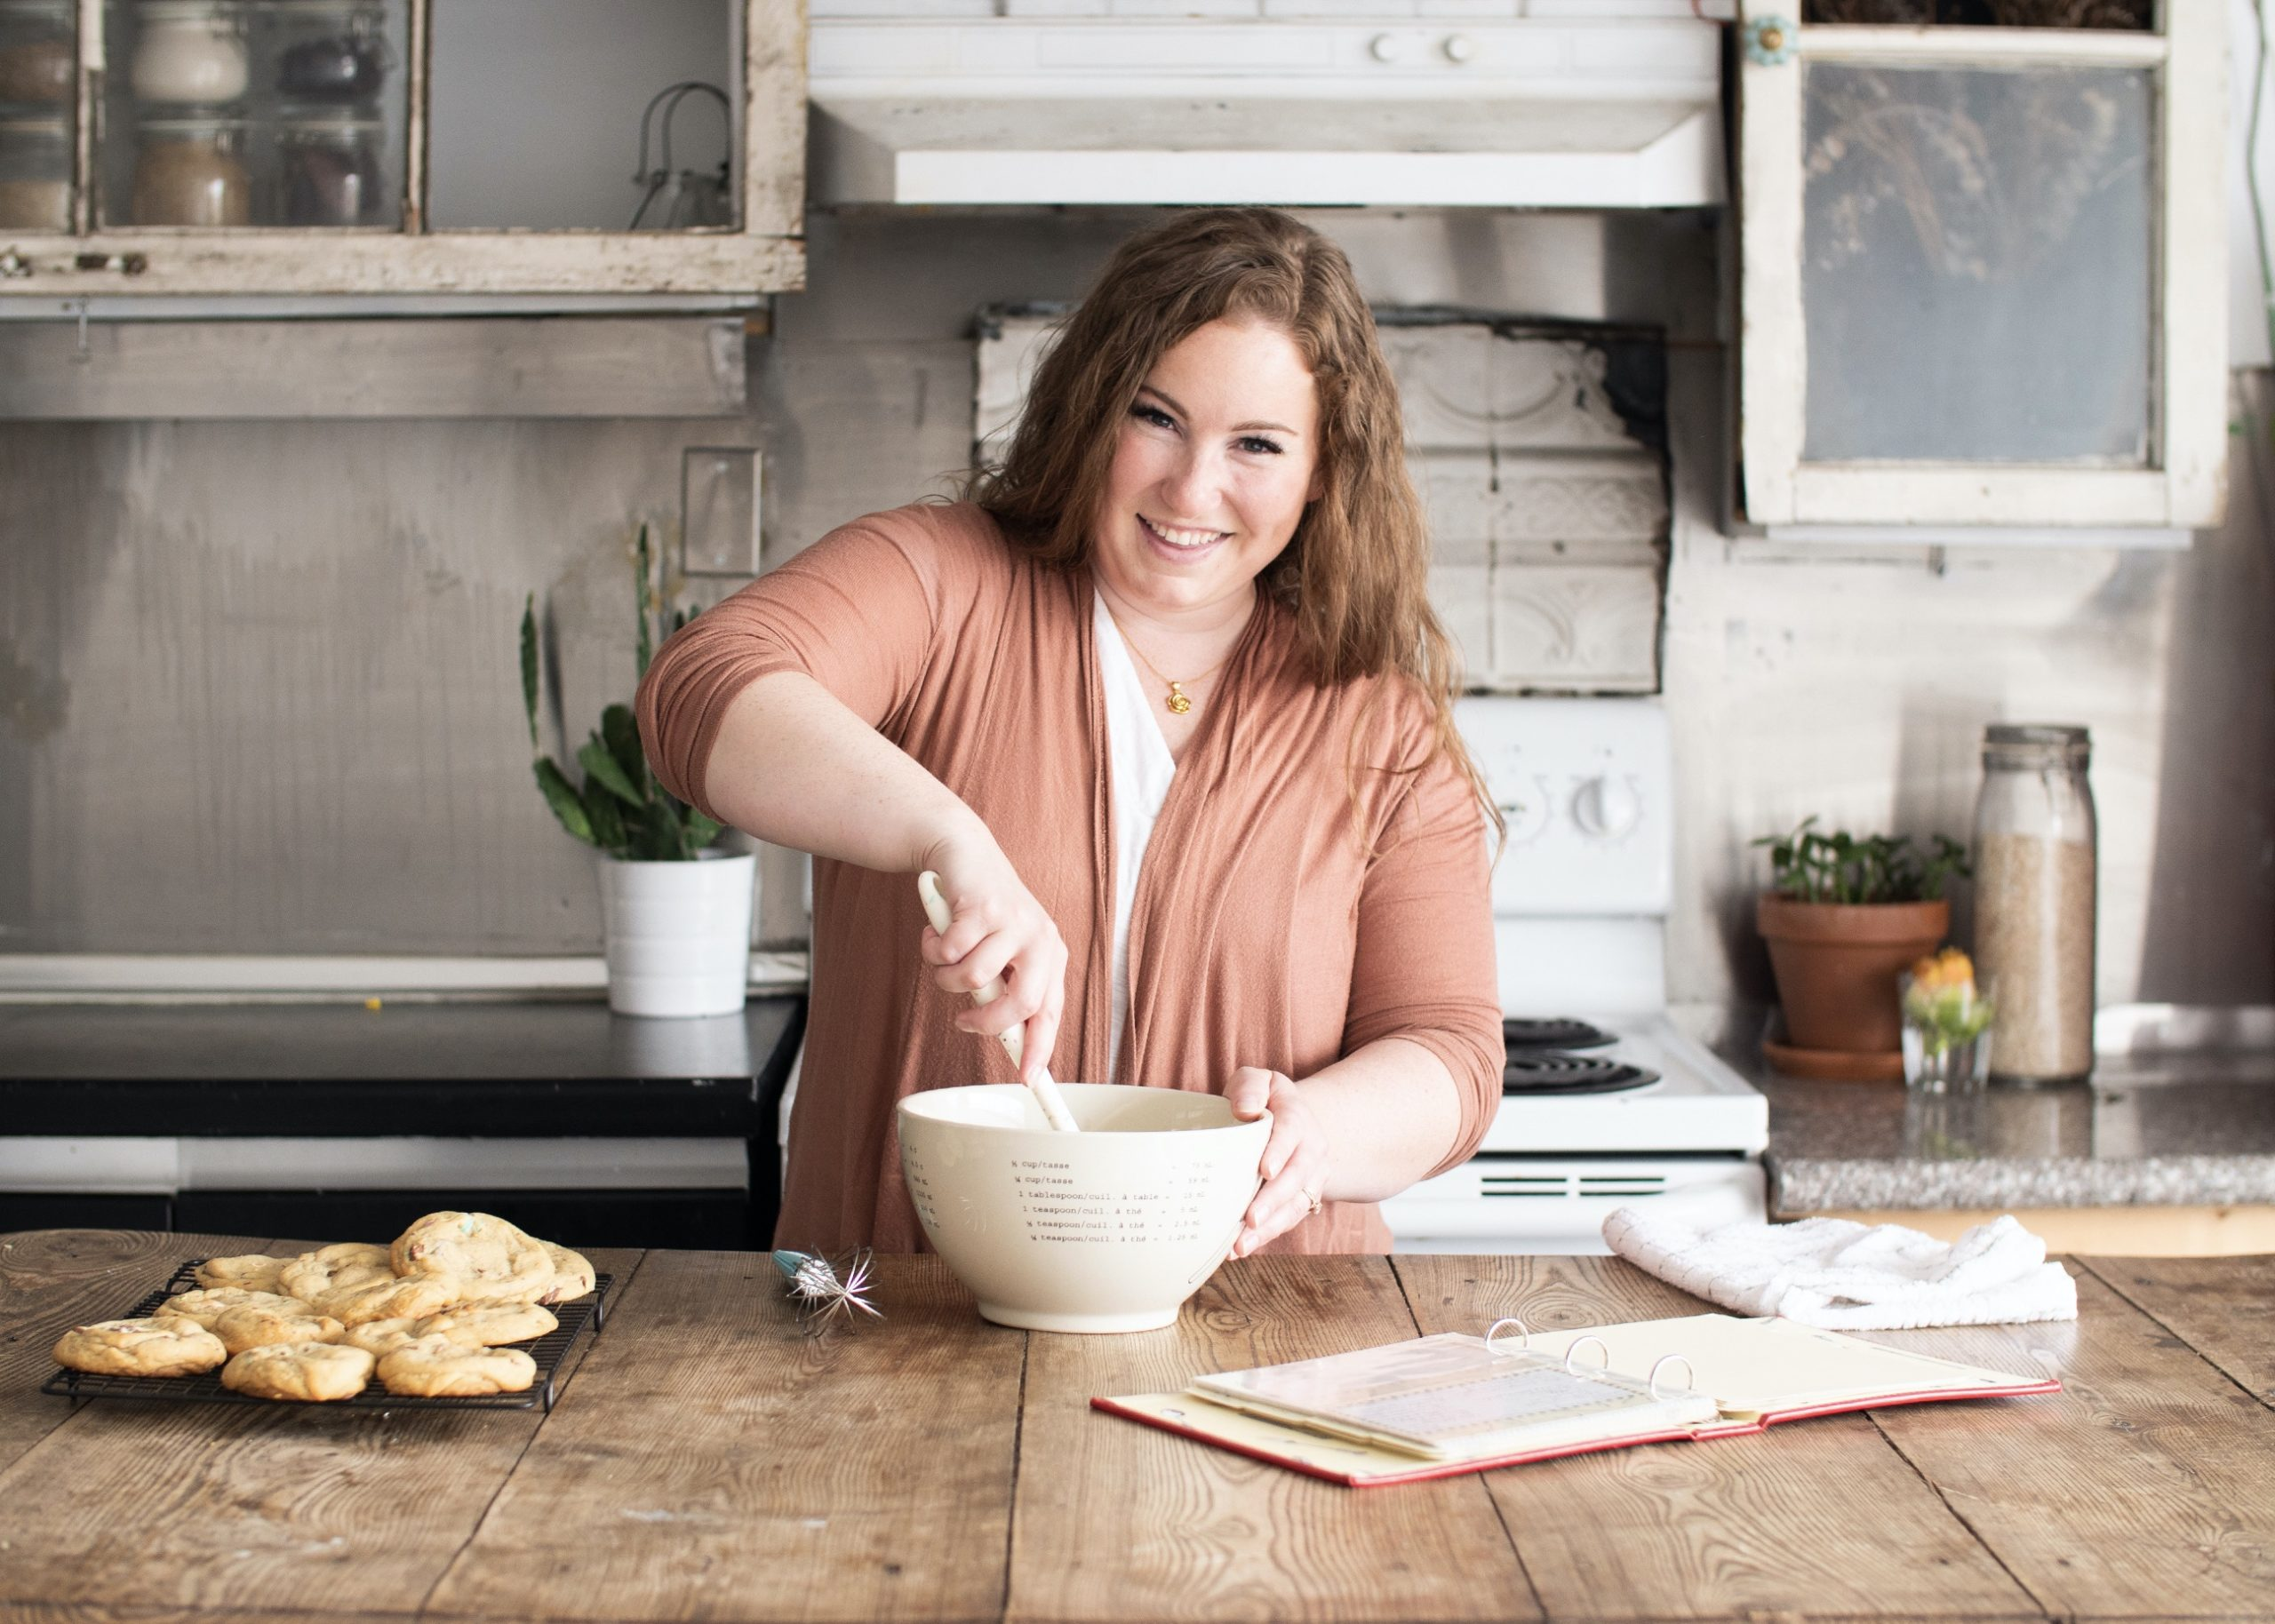 Michelle Baking